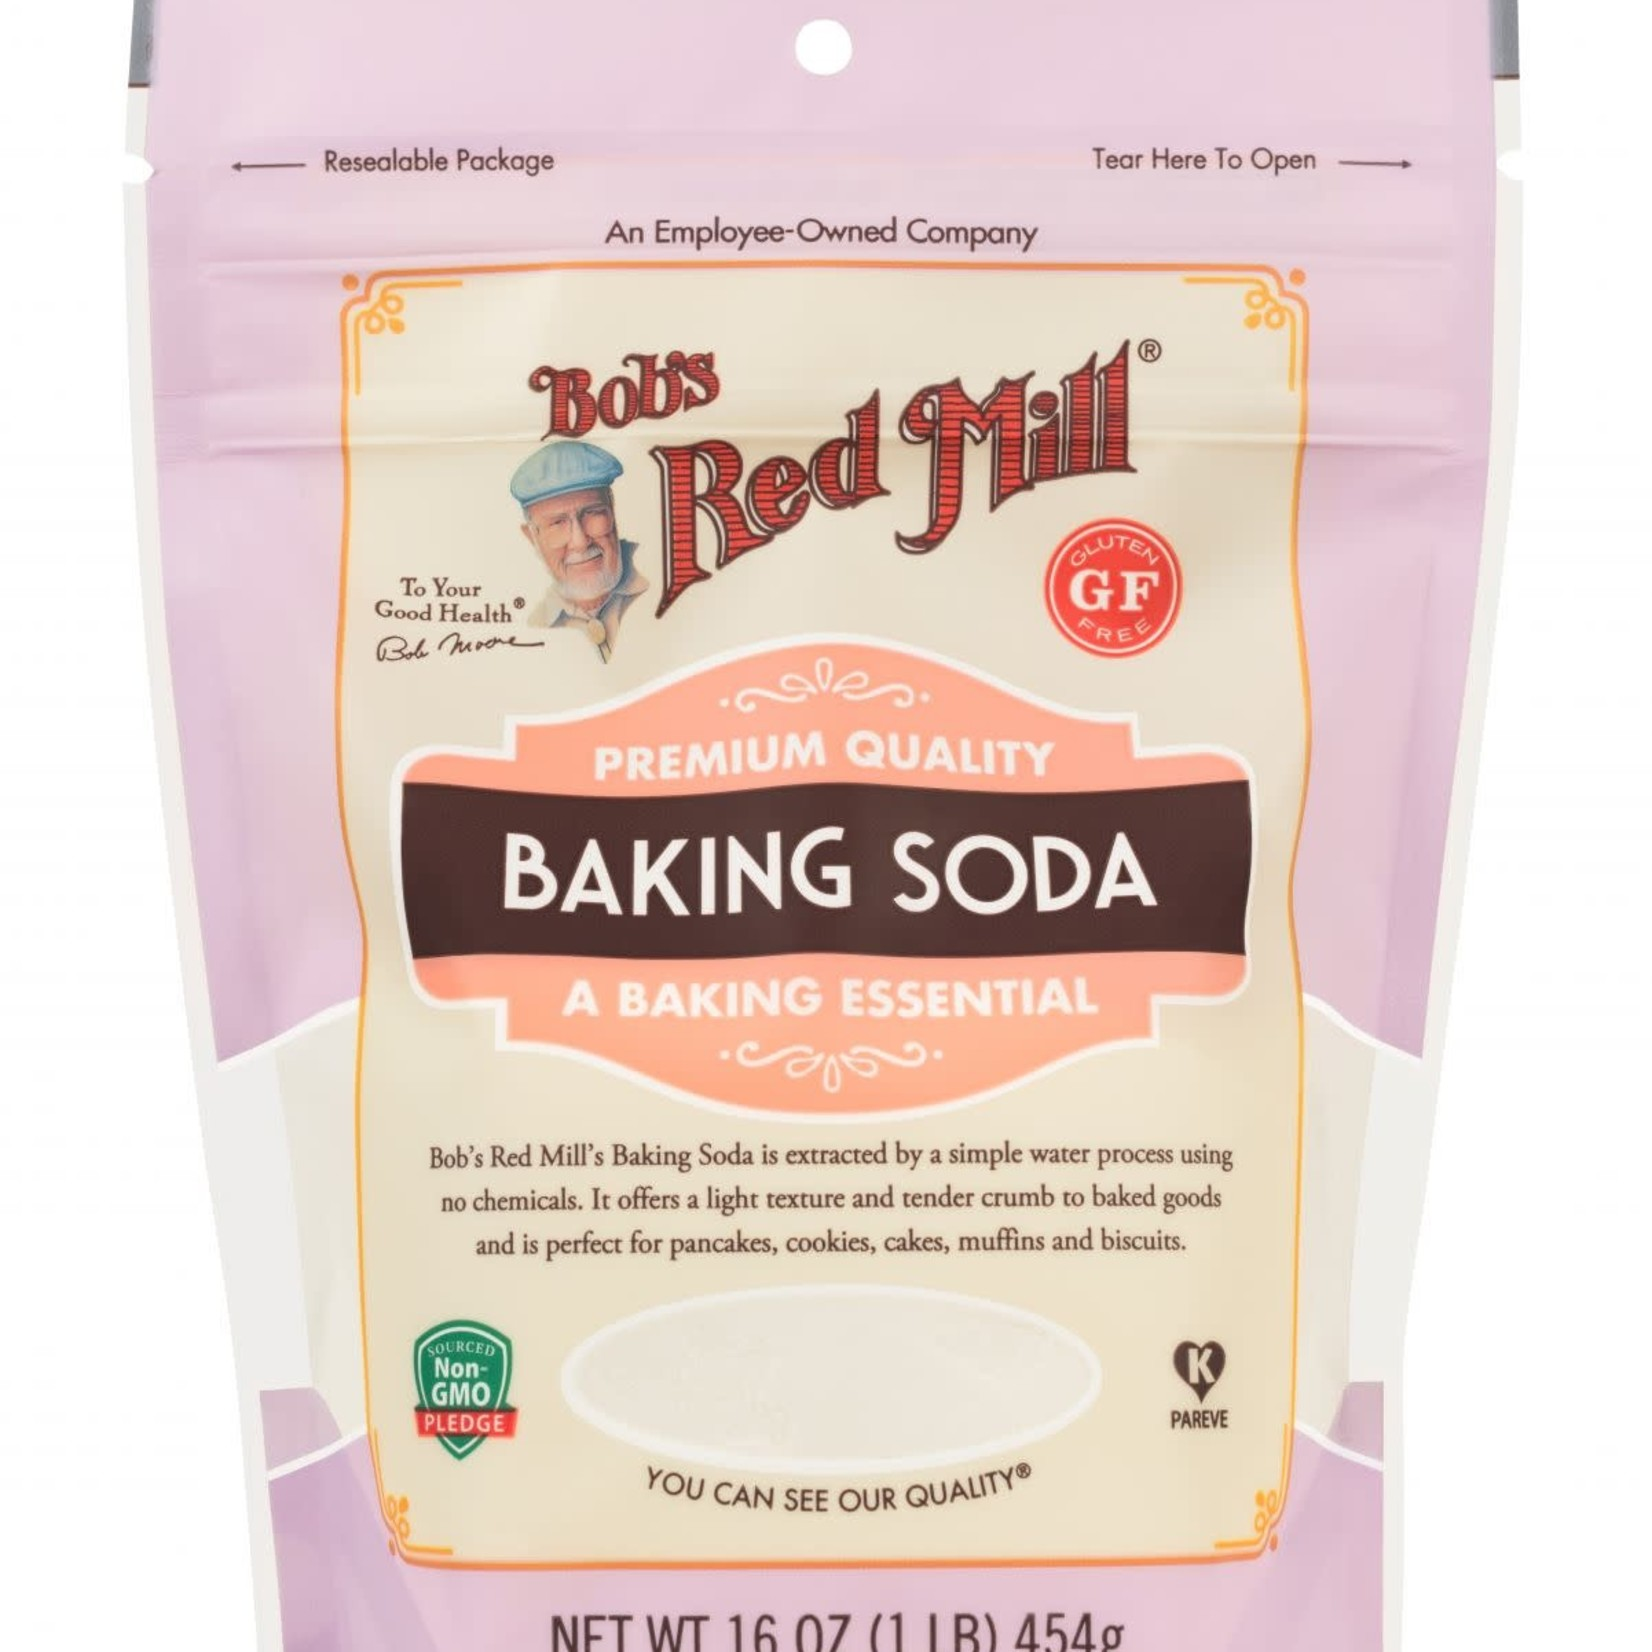 Bob's Red Mill Bob's Red Mill Baking Soda 454g